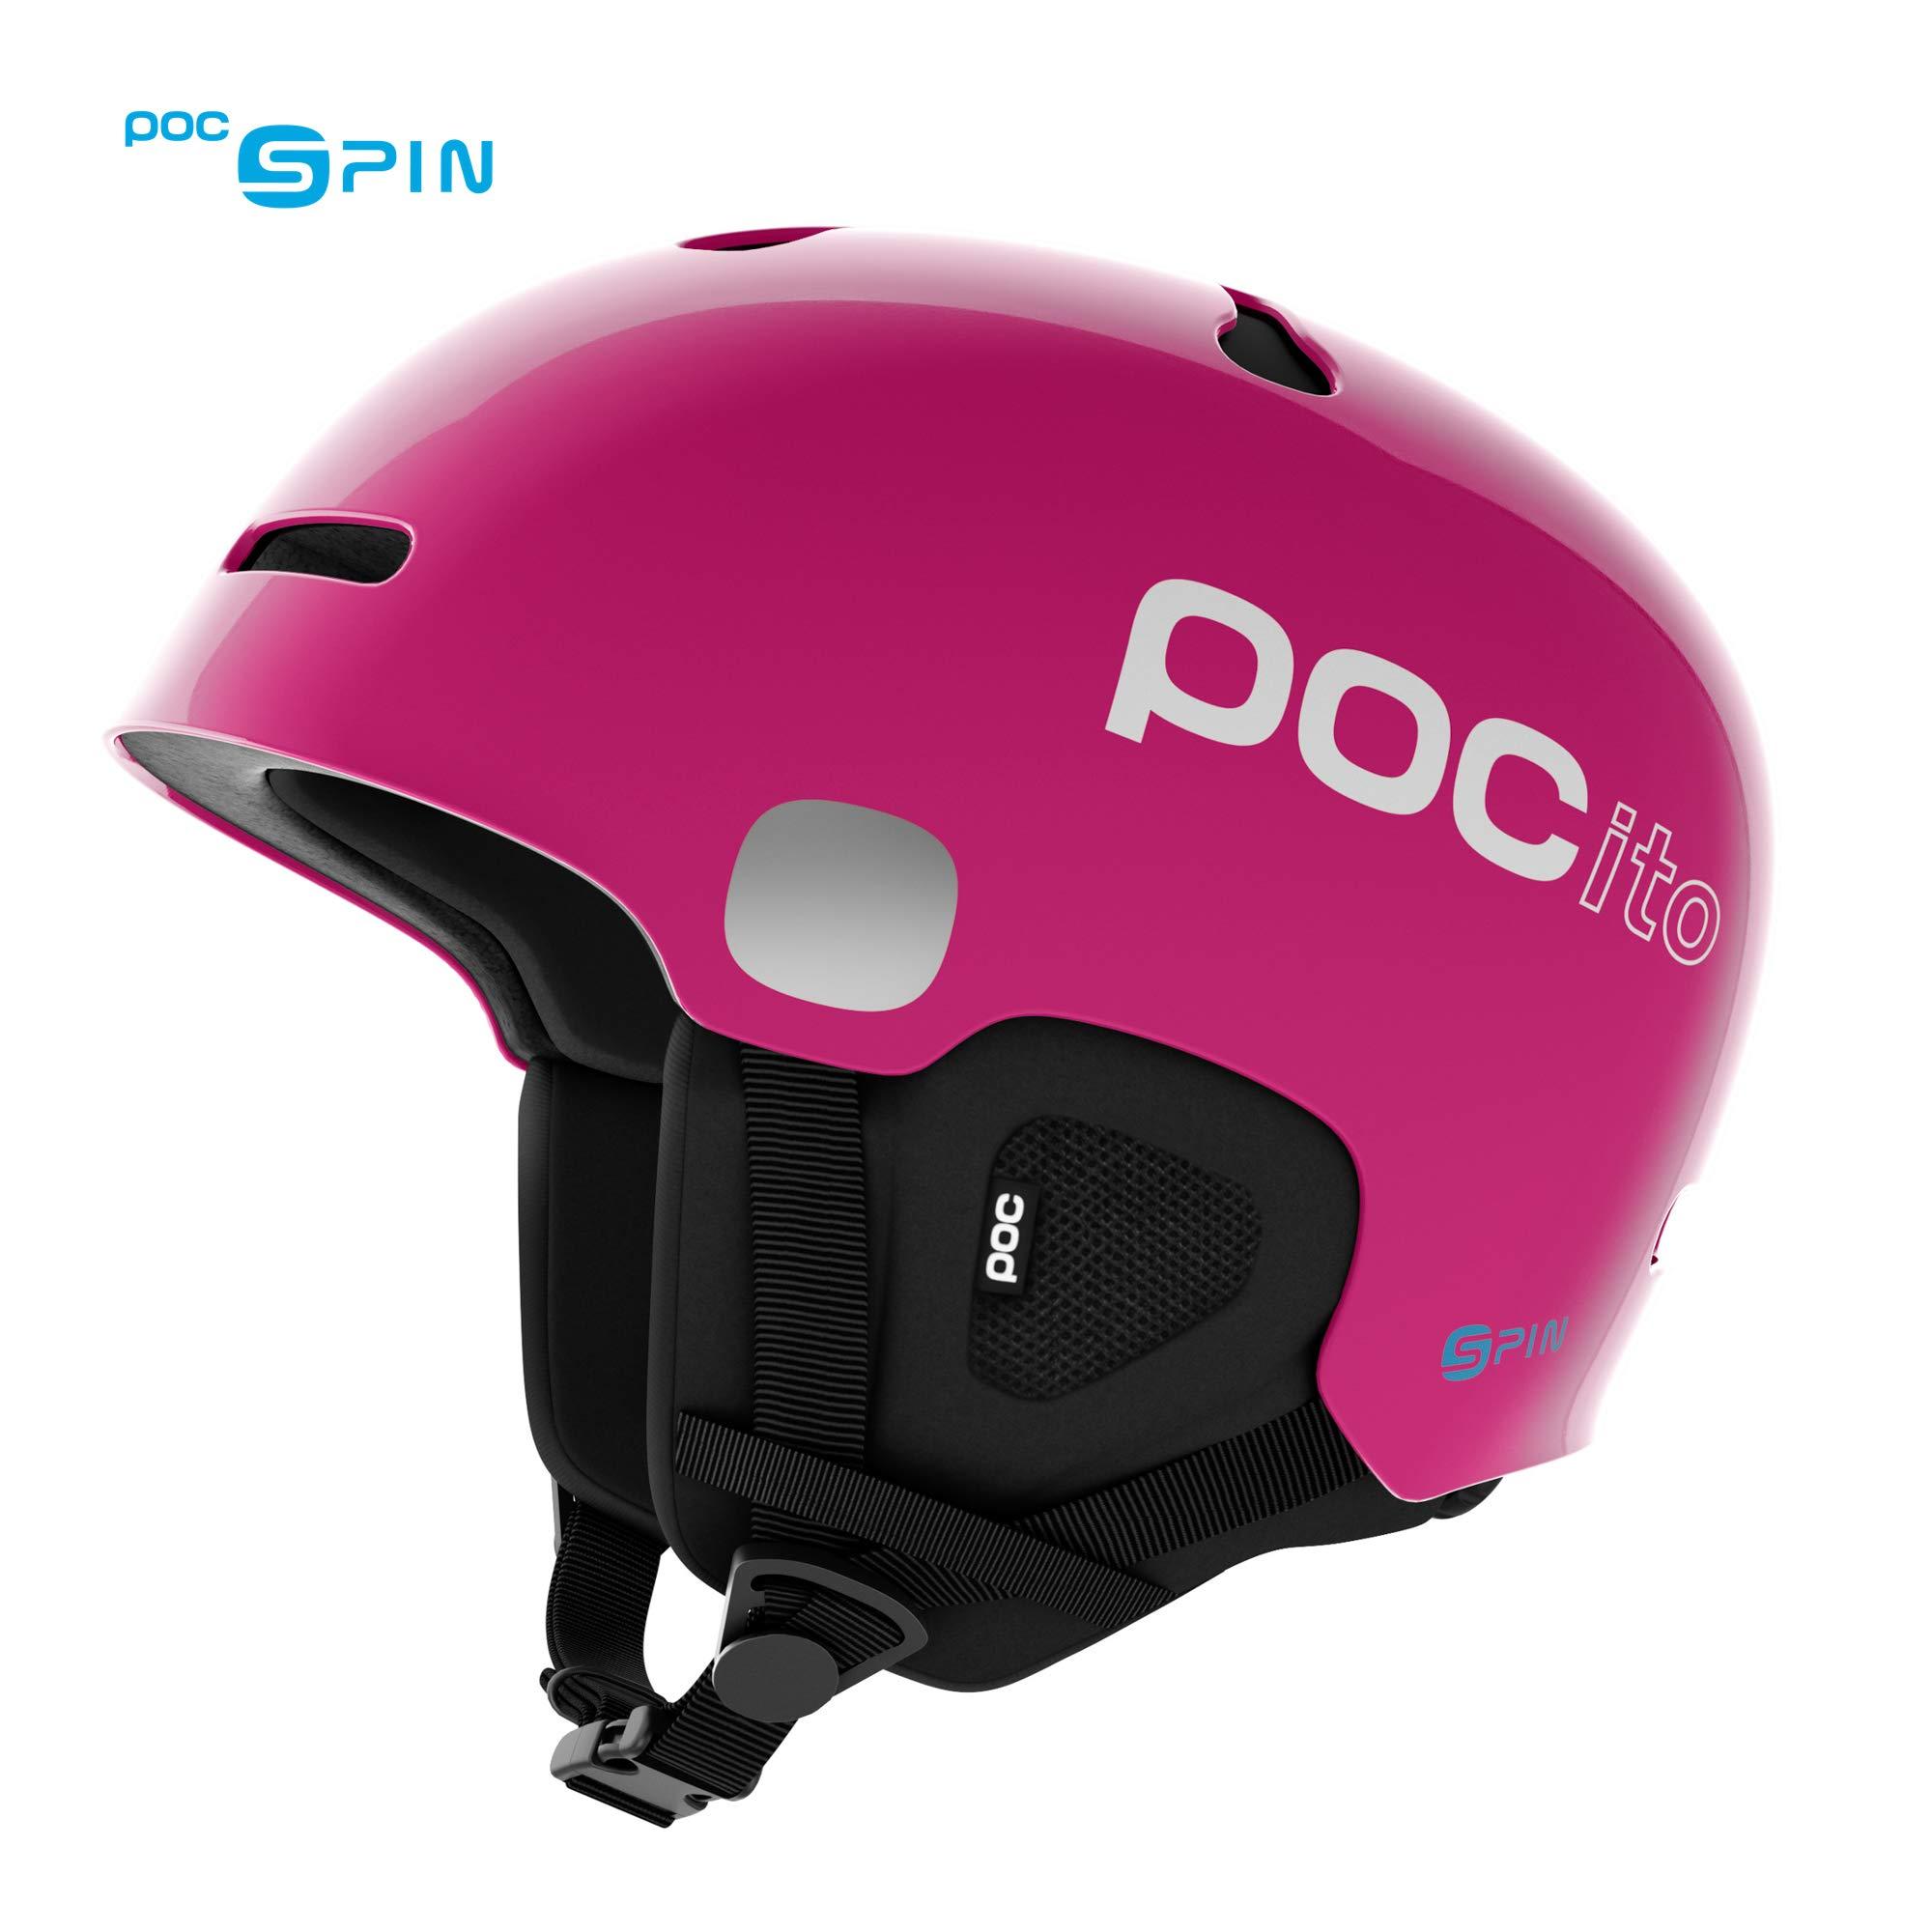 POC POCito Auric Cut Spin Kids Helmet, Fluorescent Pink, XS/S